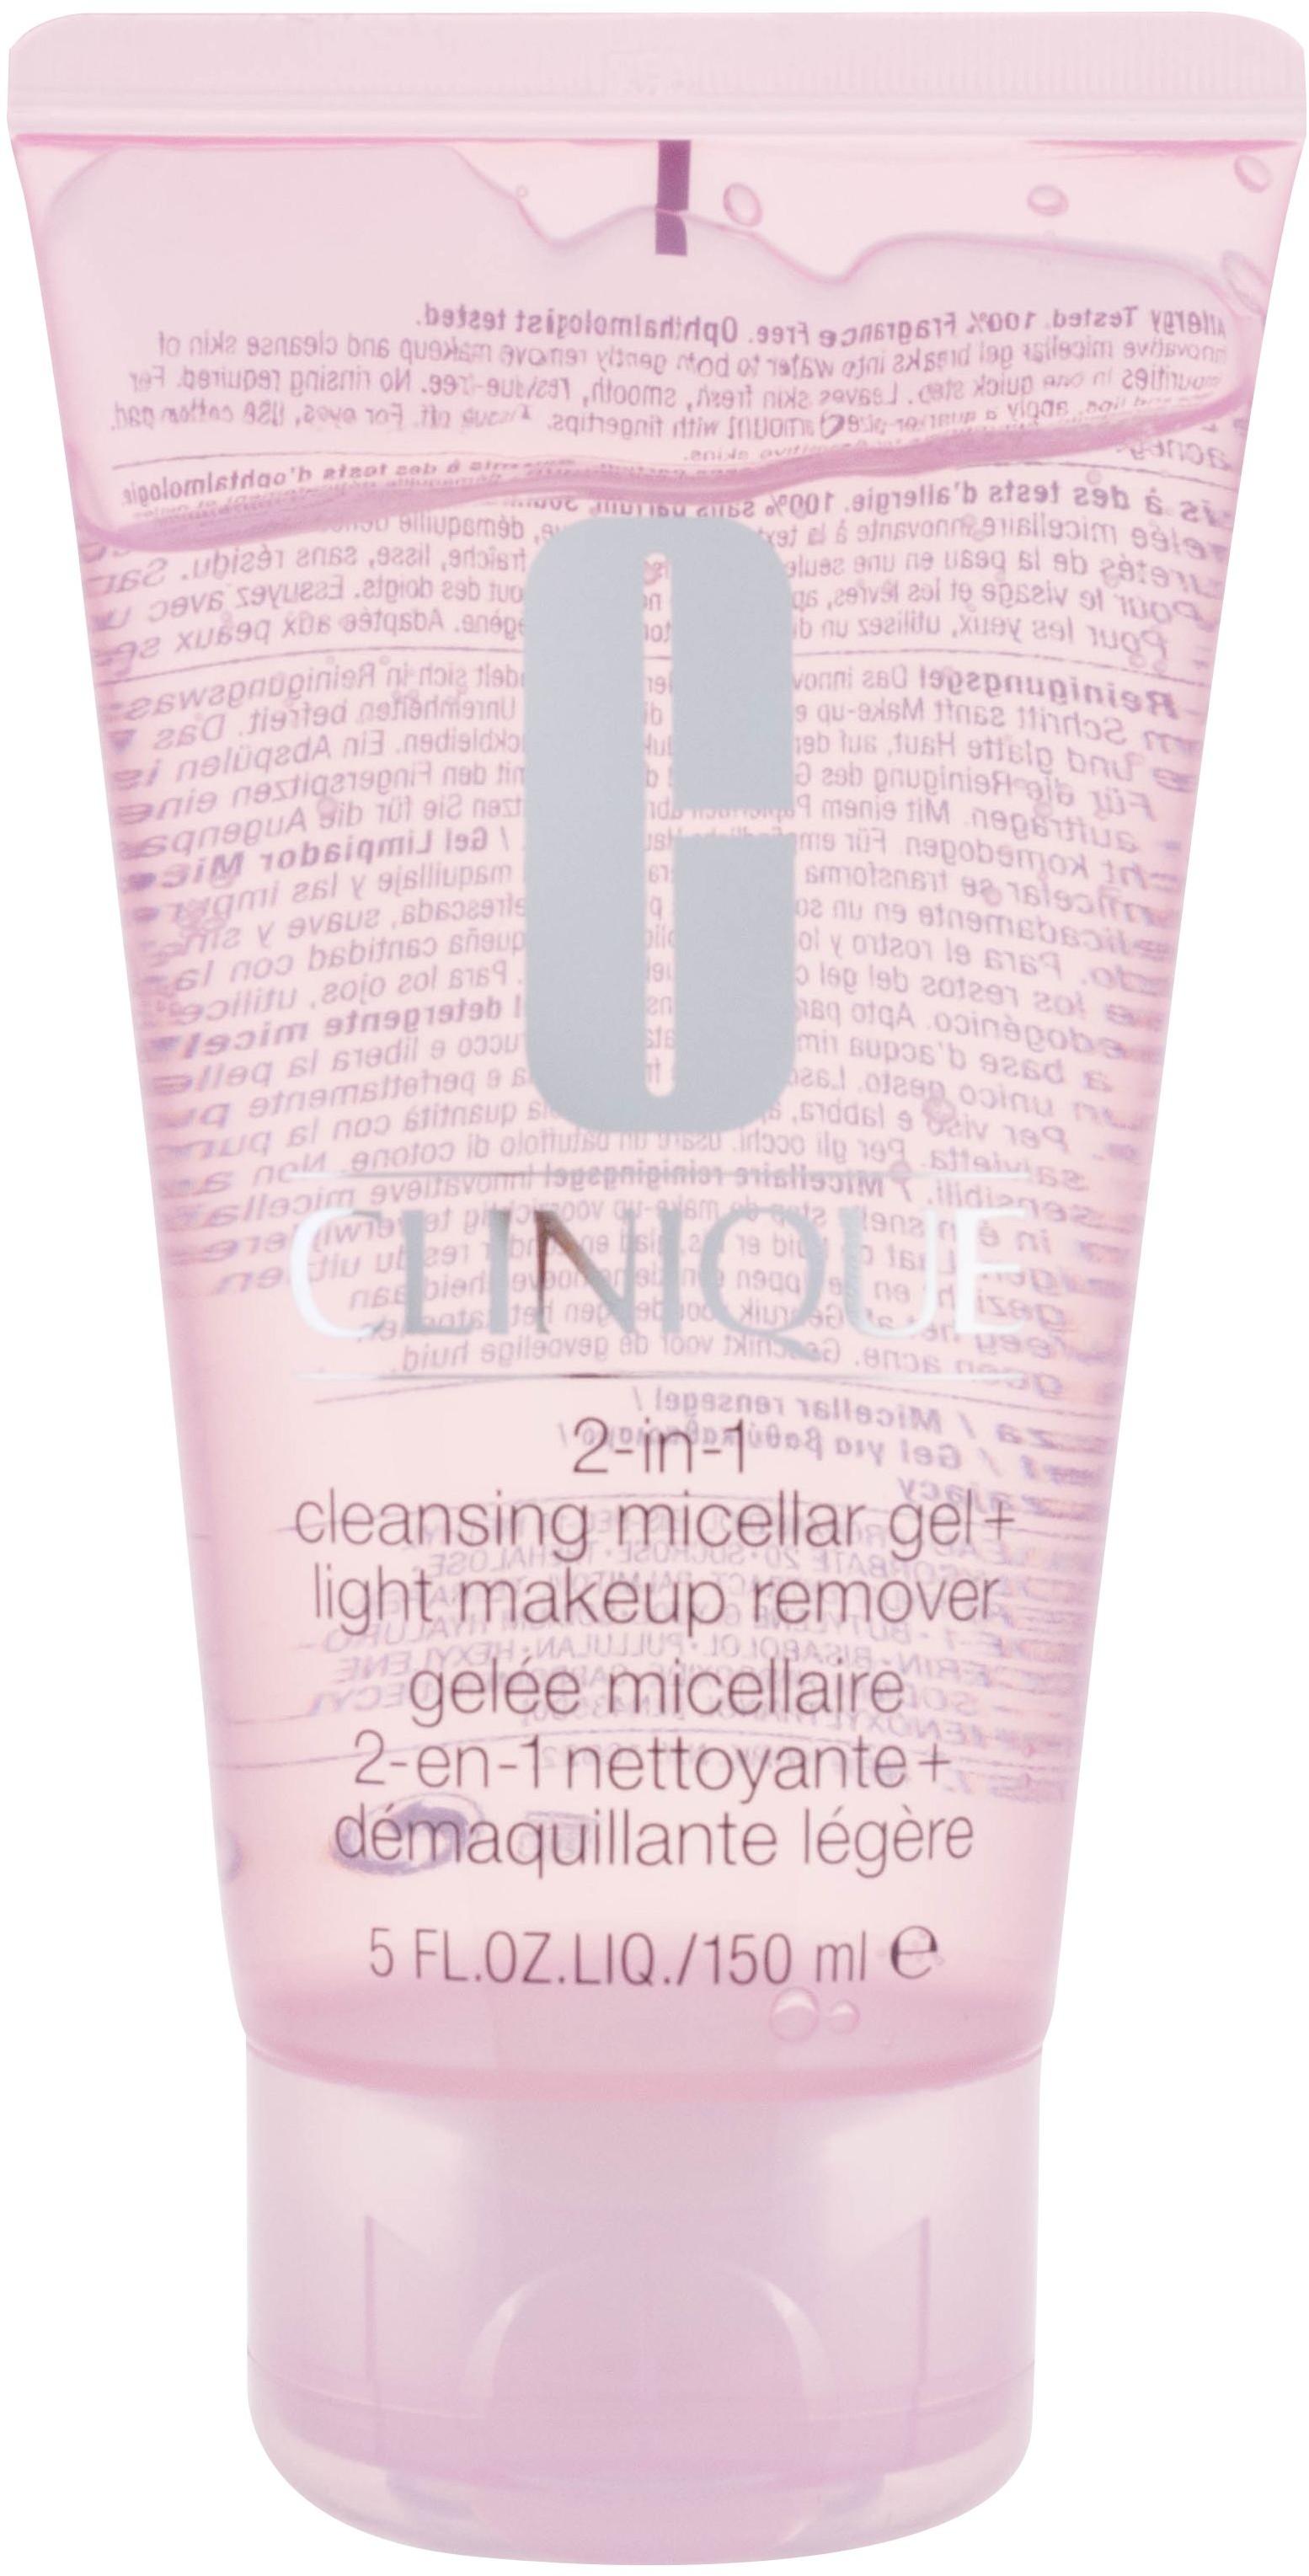 Clinique 2in1 Cleansing Micellar Gel demakijaż twarzy 150 ml dla kobiet